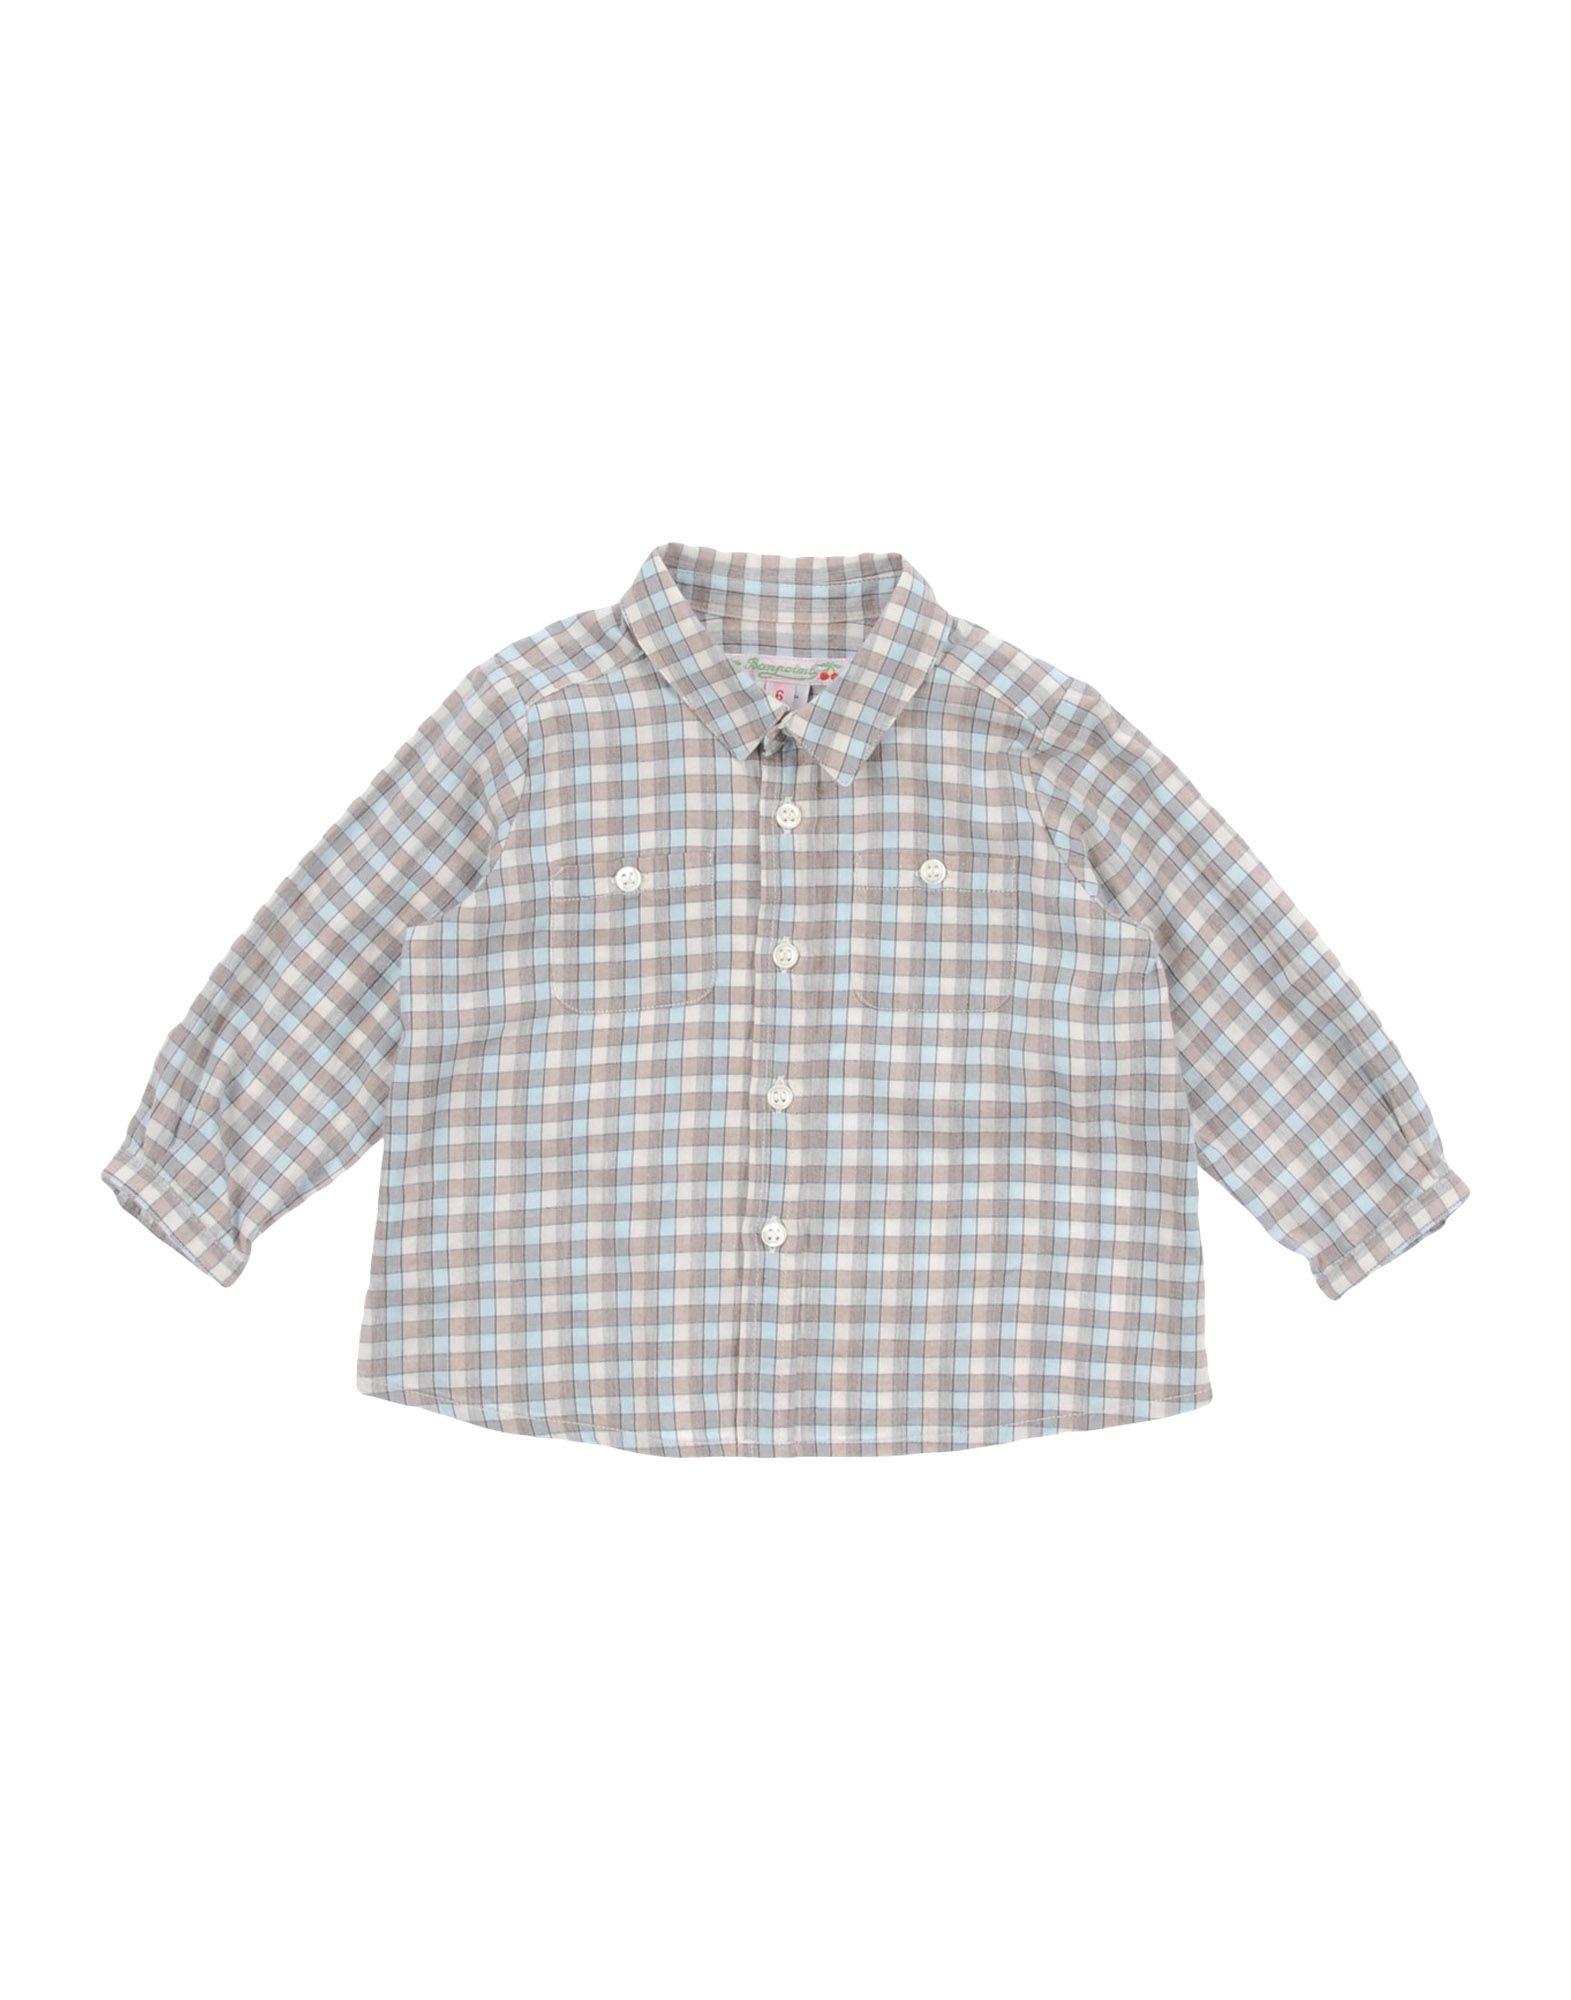 BONPOINT Checked Shirt in Beige